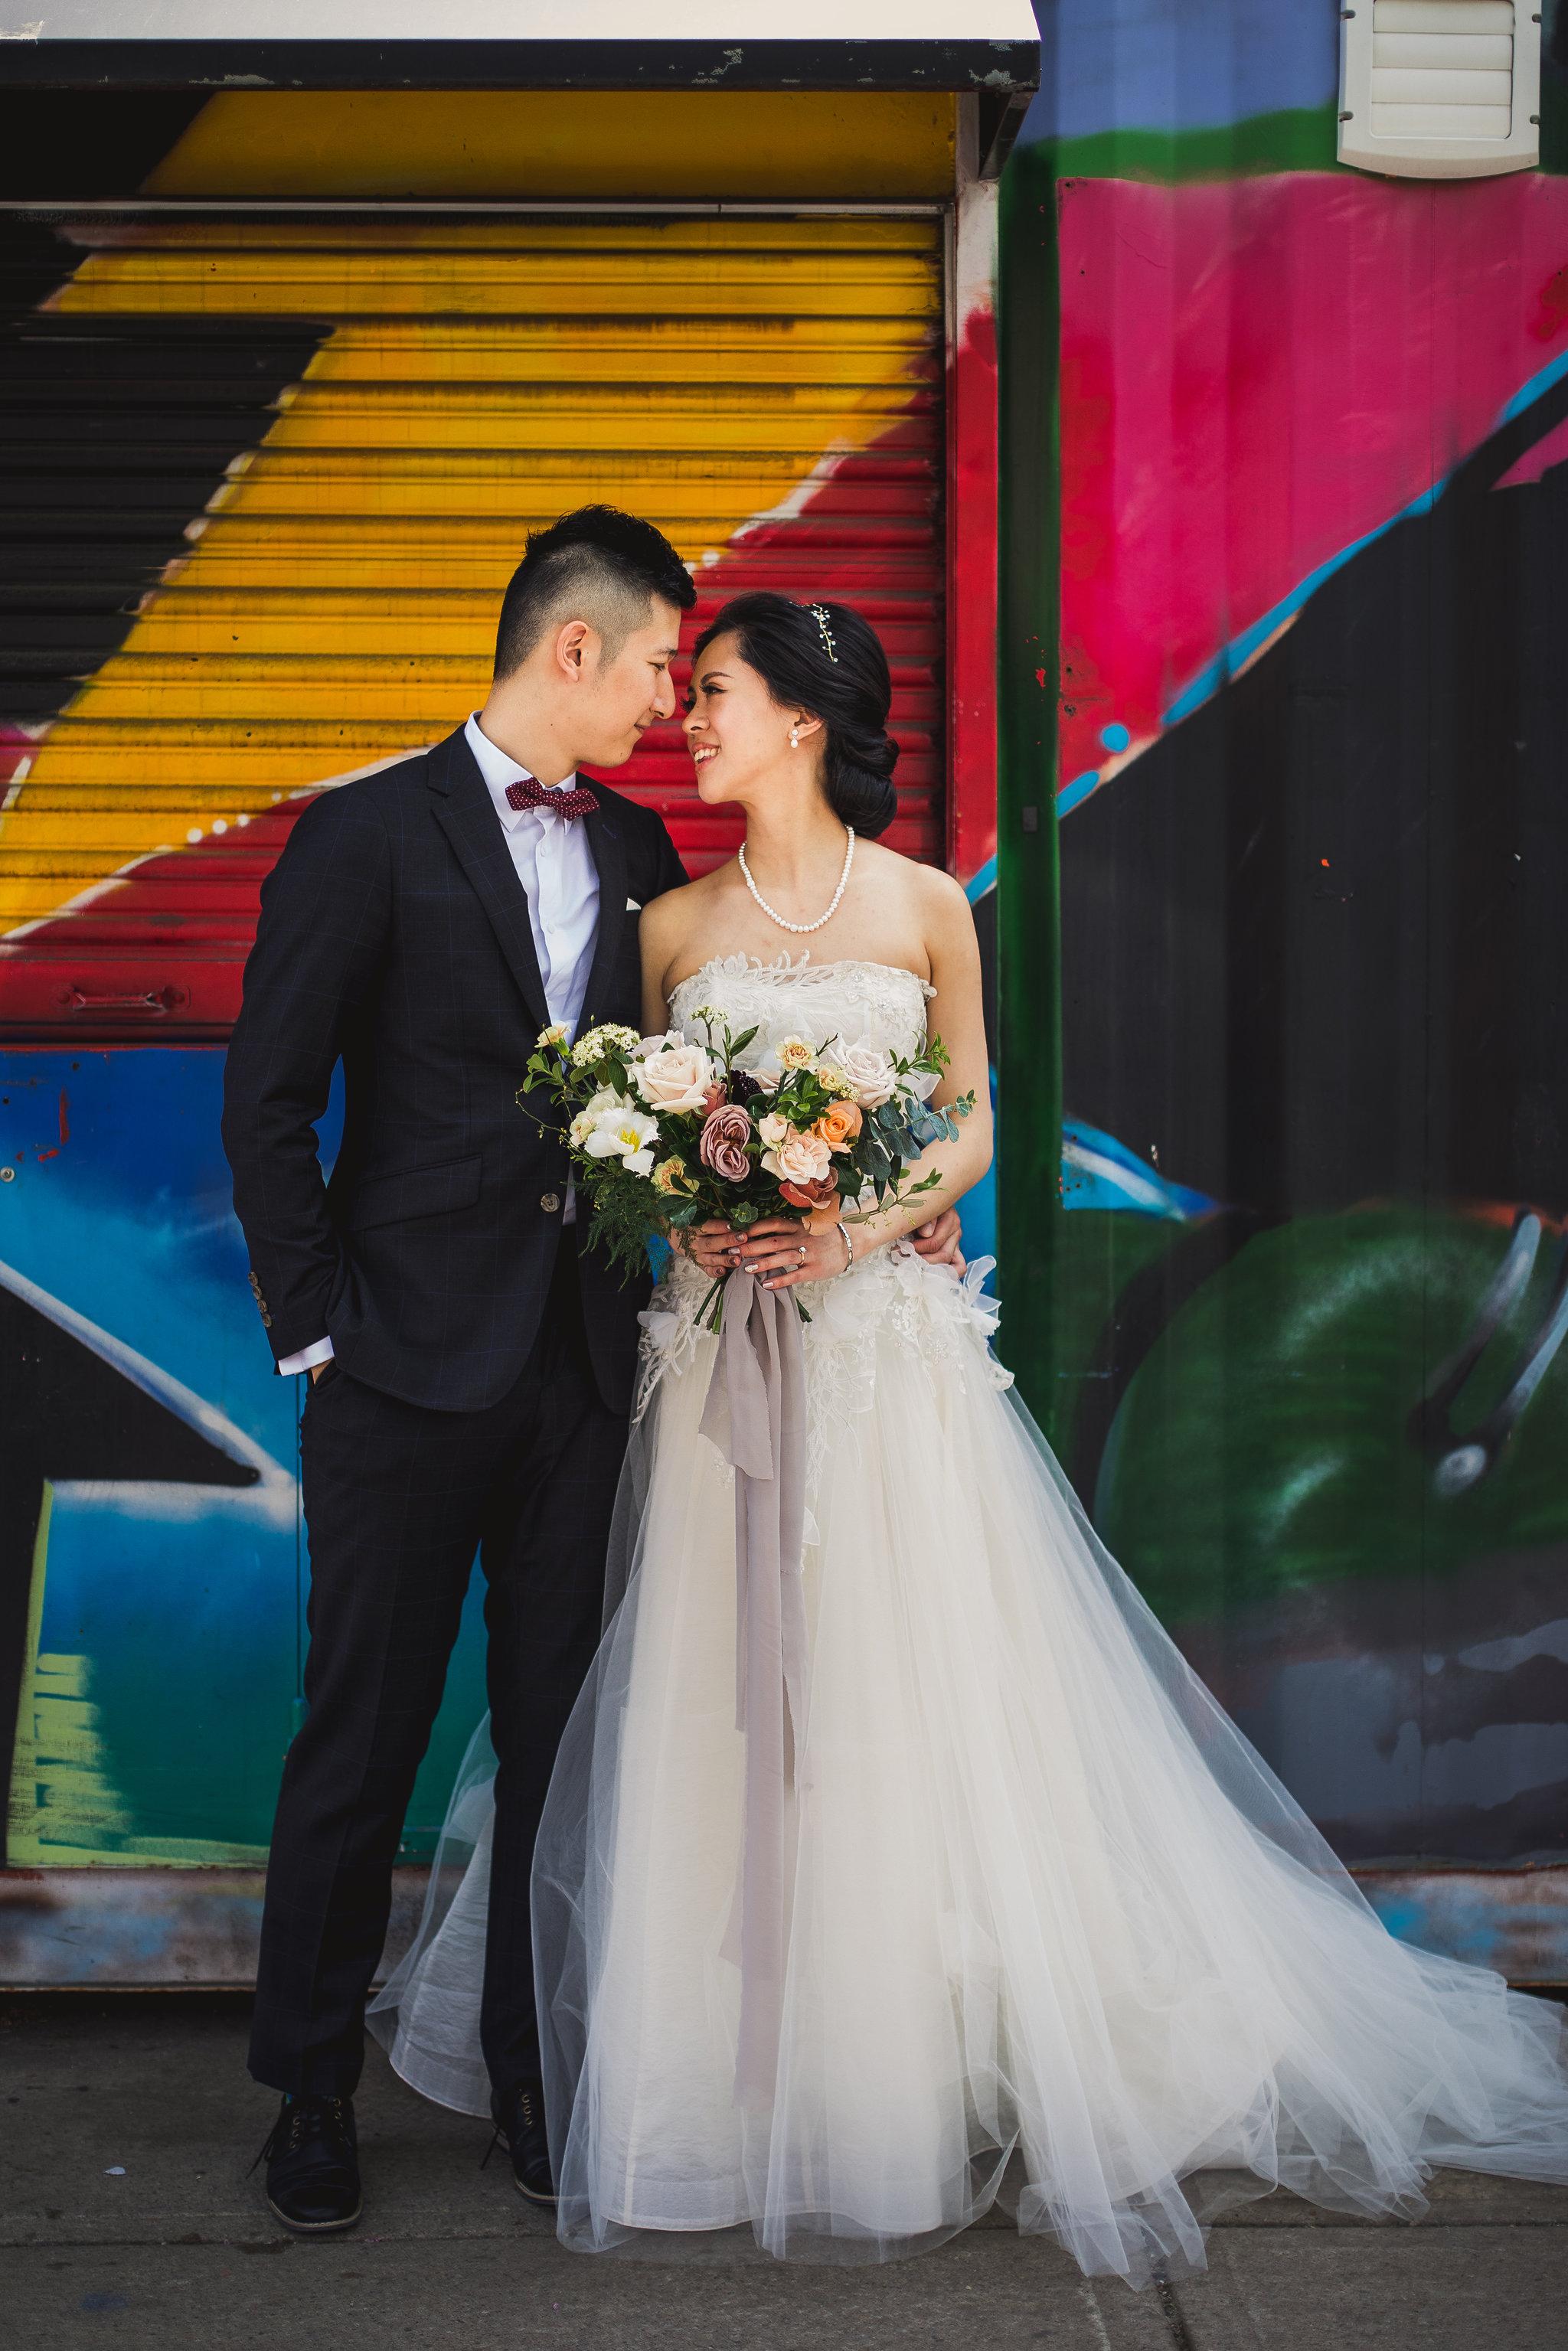 Jessica Jason Hotel Ocho Wedding Photos 170 - Hotel Ocho Wedding